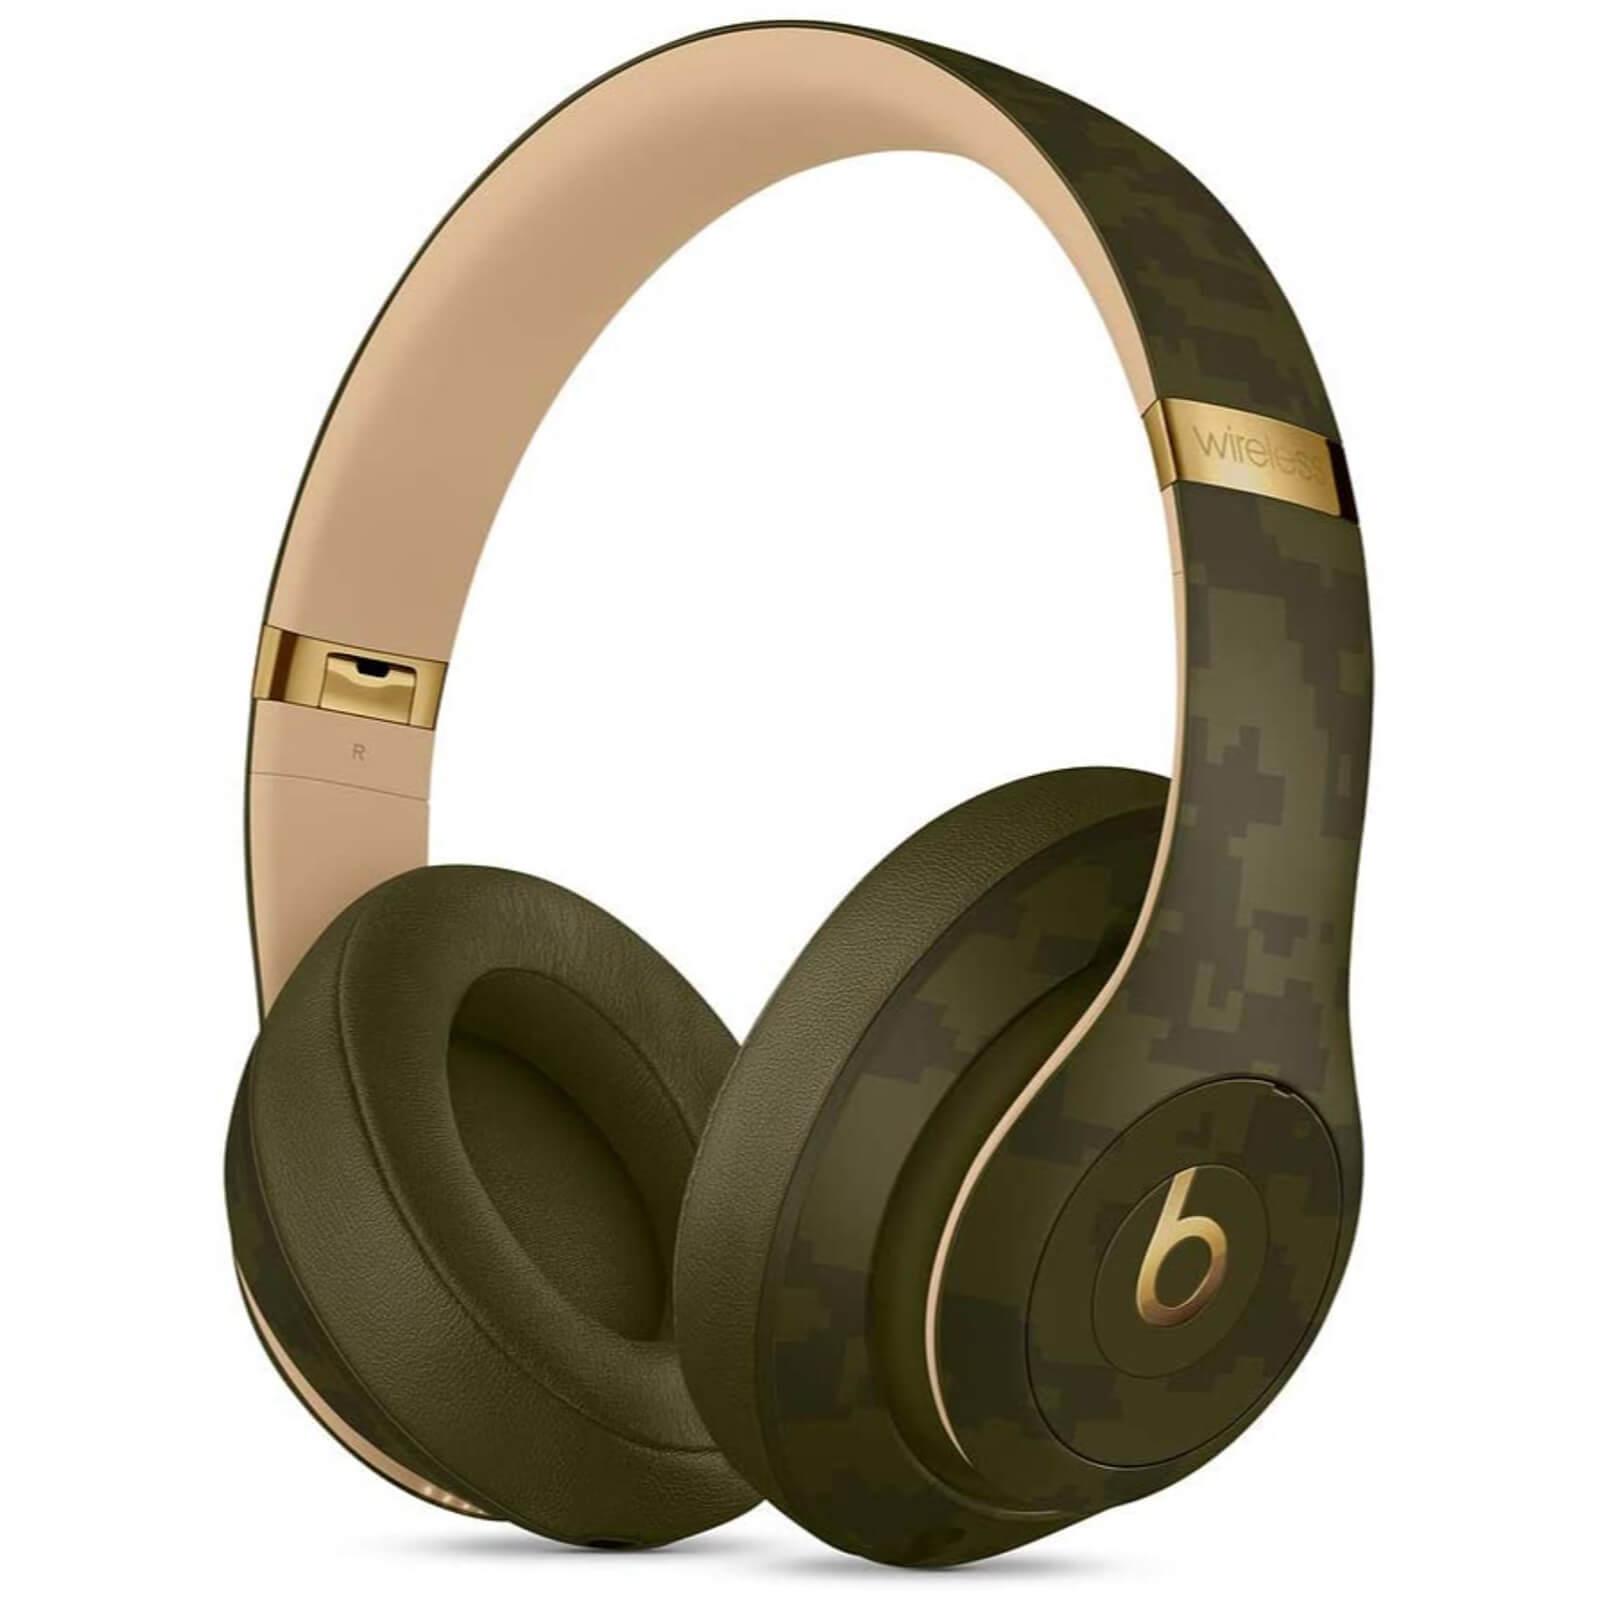 Beats Studio3 Wireless Headphones - Beats Camo Collection - Forest...